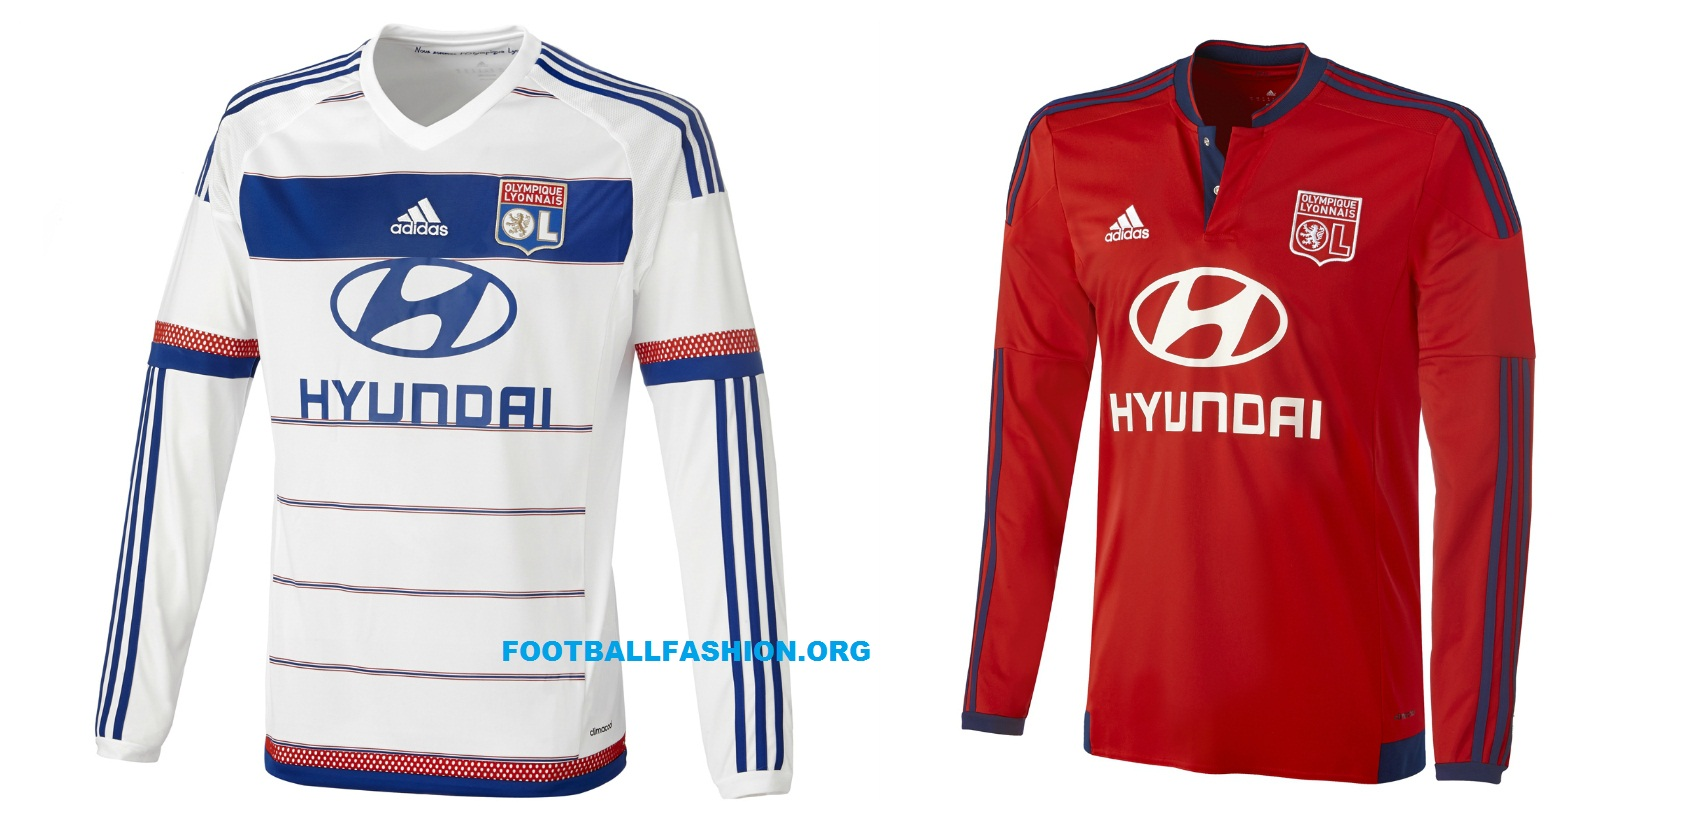 wholesale dealer b3303 efc59 Olympique Lyon 2015/16 adidas Home and Away Kits - FOOTBALL ...